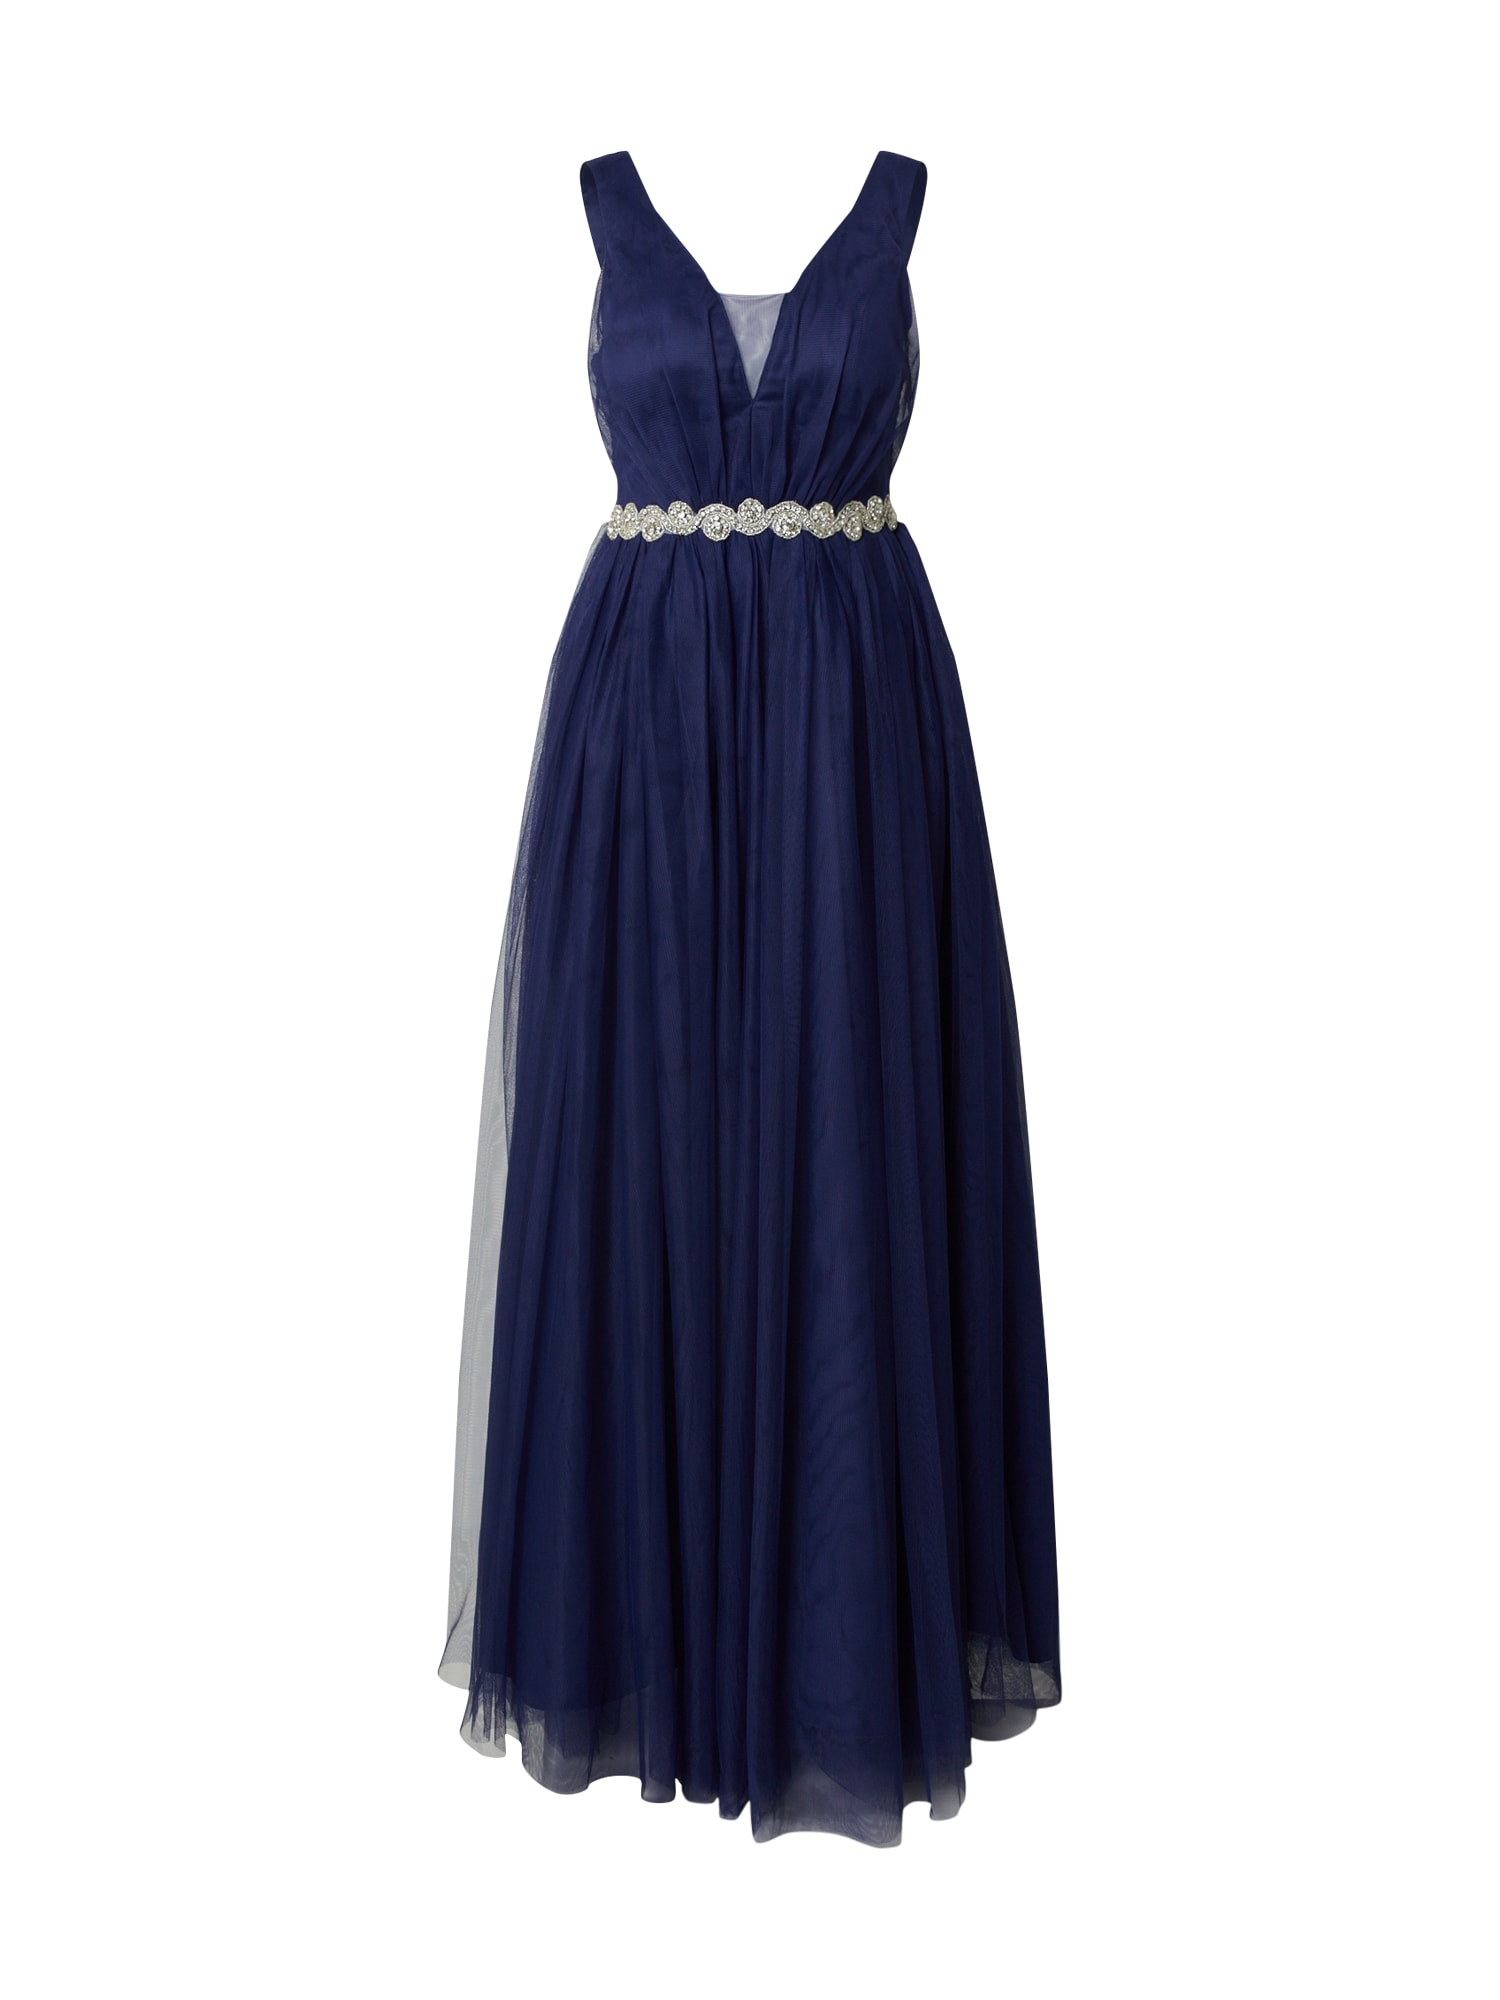 Forever Unique Vakarinė suknelė mėlyna dūmų spalva / tamsiai mėlyna